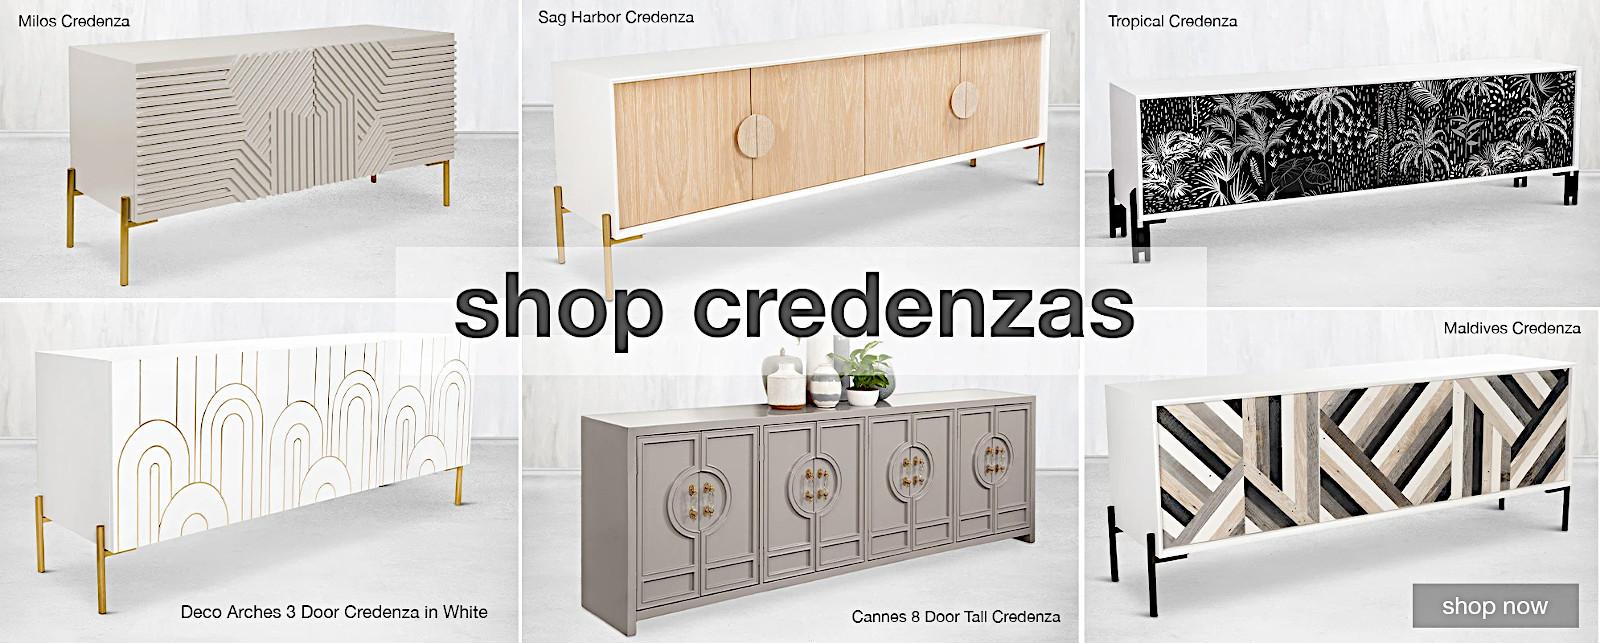 Tasteful modern credenzas, dressers and sideboards